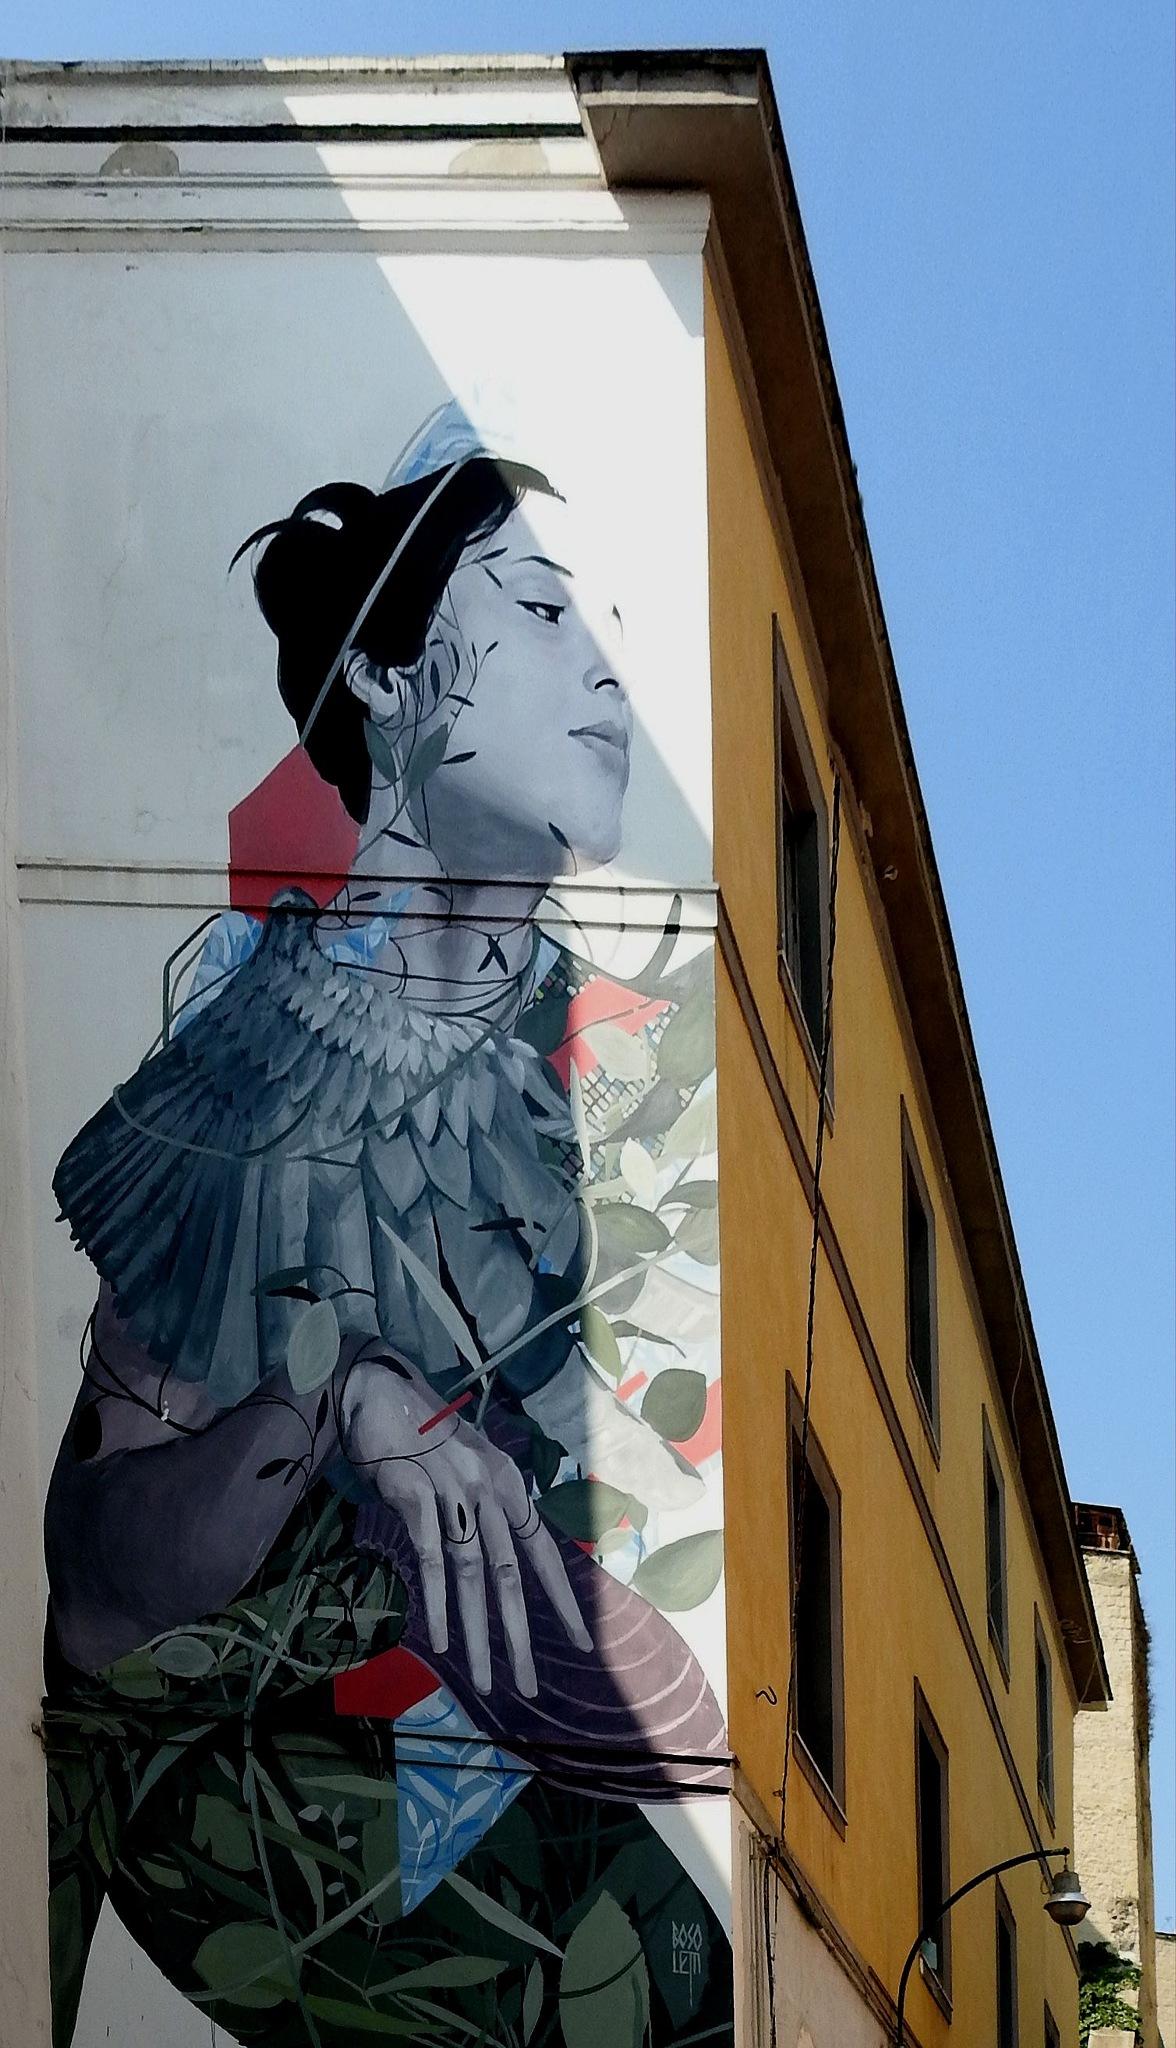 Naples Materdei - Street Art - Partenope of Francisco Bosoletti - 3 by Arnaldo De Lisio